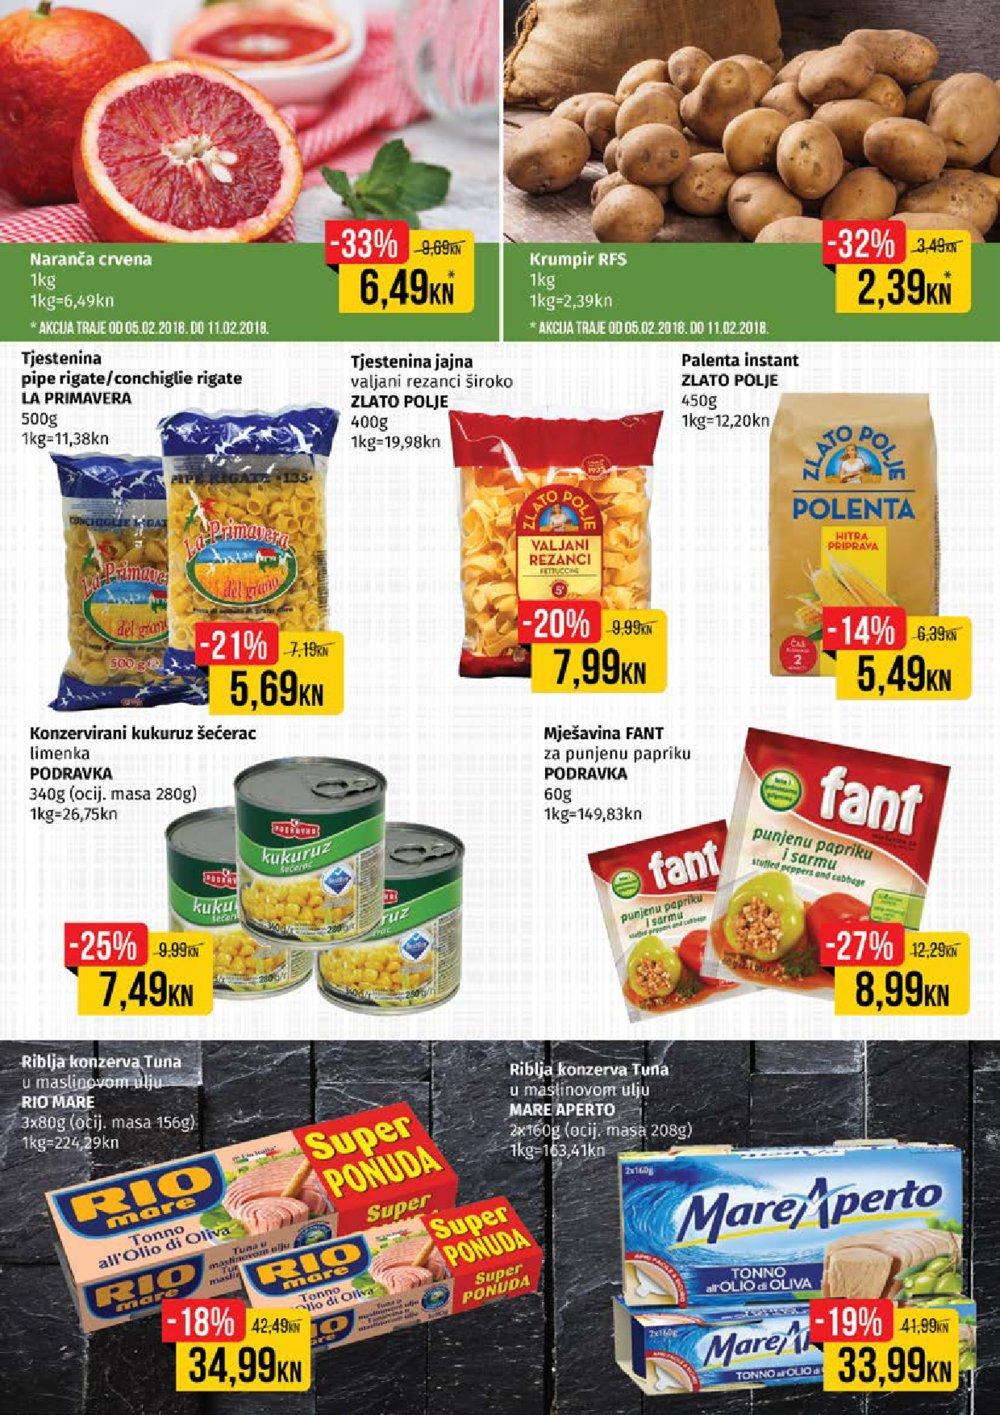 Istarski supermarketi katalog Akcija 05.02.-18.02.2018.